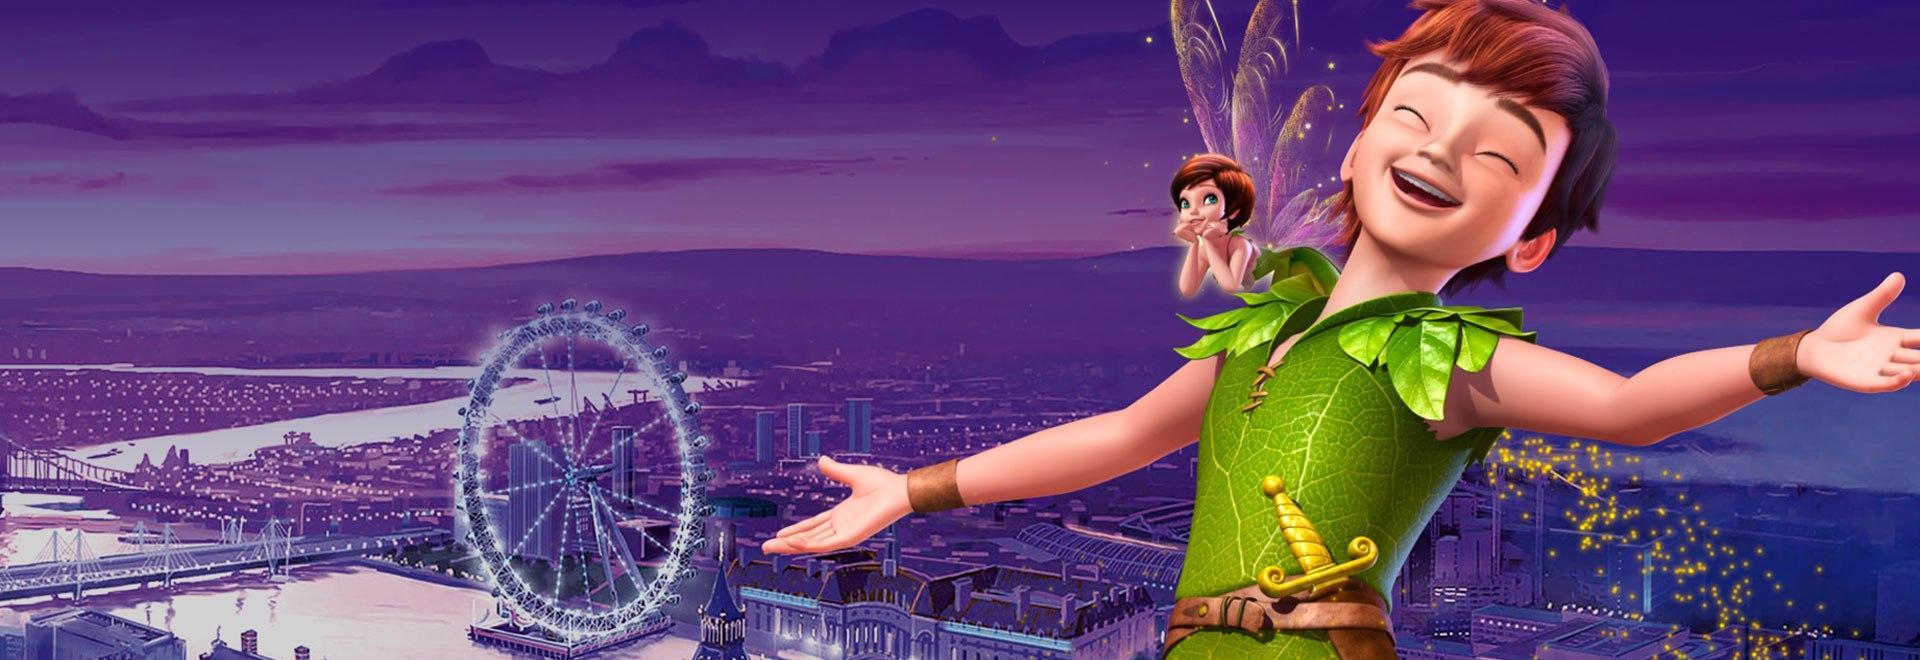 Le nuove avventure di Peter Pan - Stag. 2 Ep. 14 - Talenti naturali